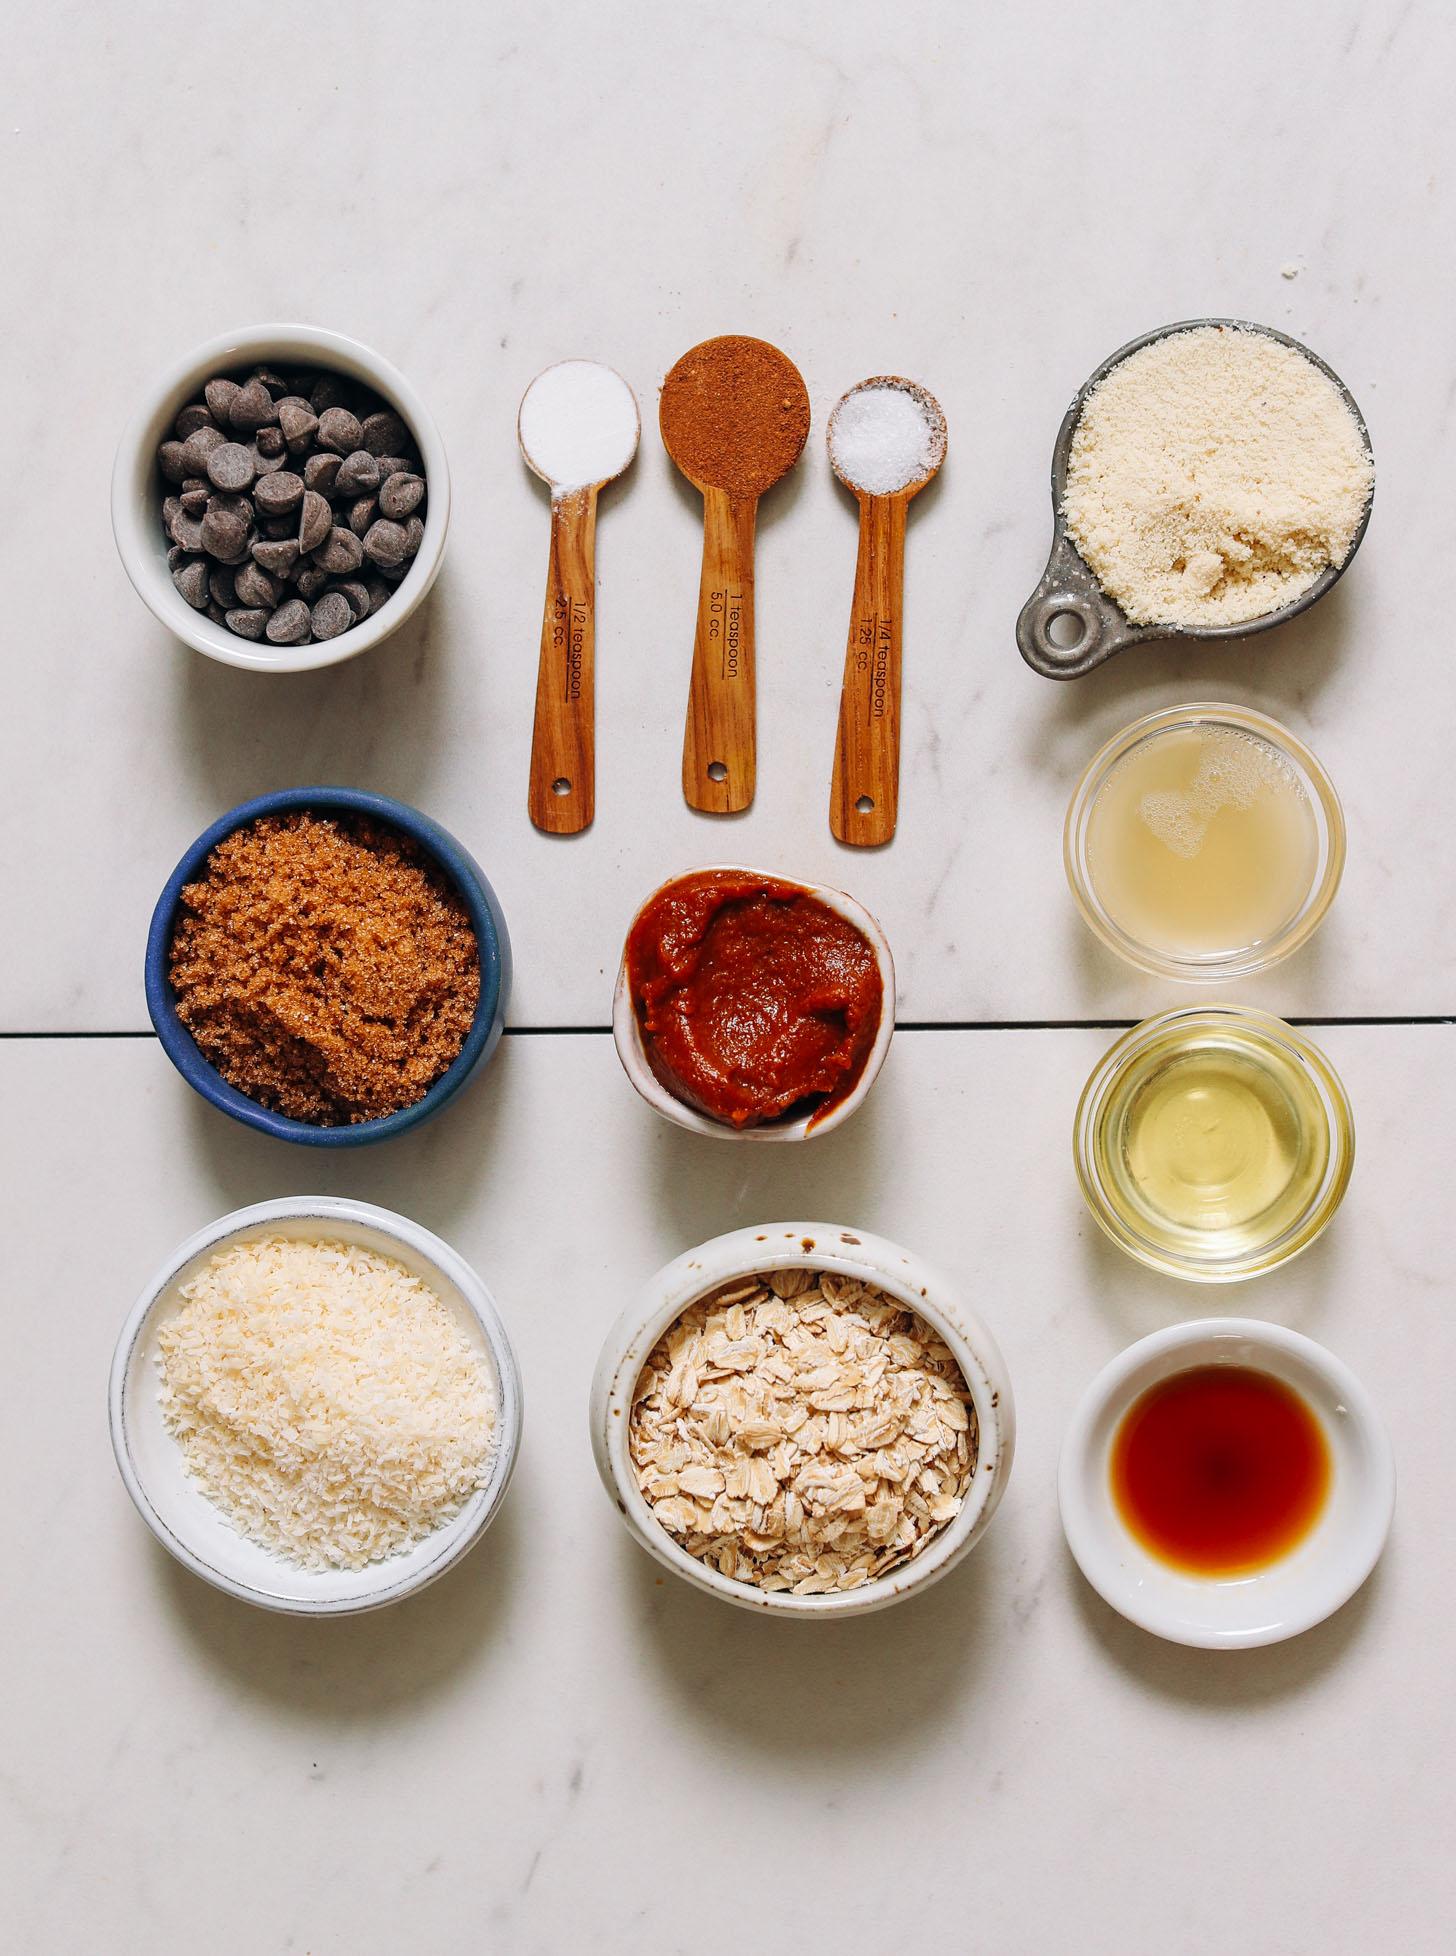 Vegan chocolate chips, baking powder, pumpkin pie spice, salt, almond flour, aquafaba, avocado oil, vanilla, oats, pumpkin butter, brown sugar, and shredded coconut